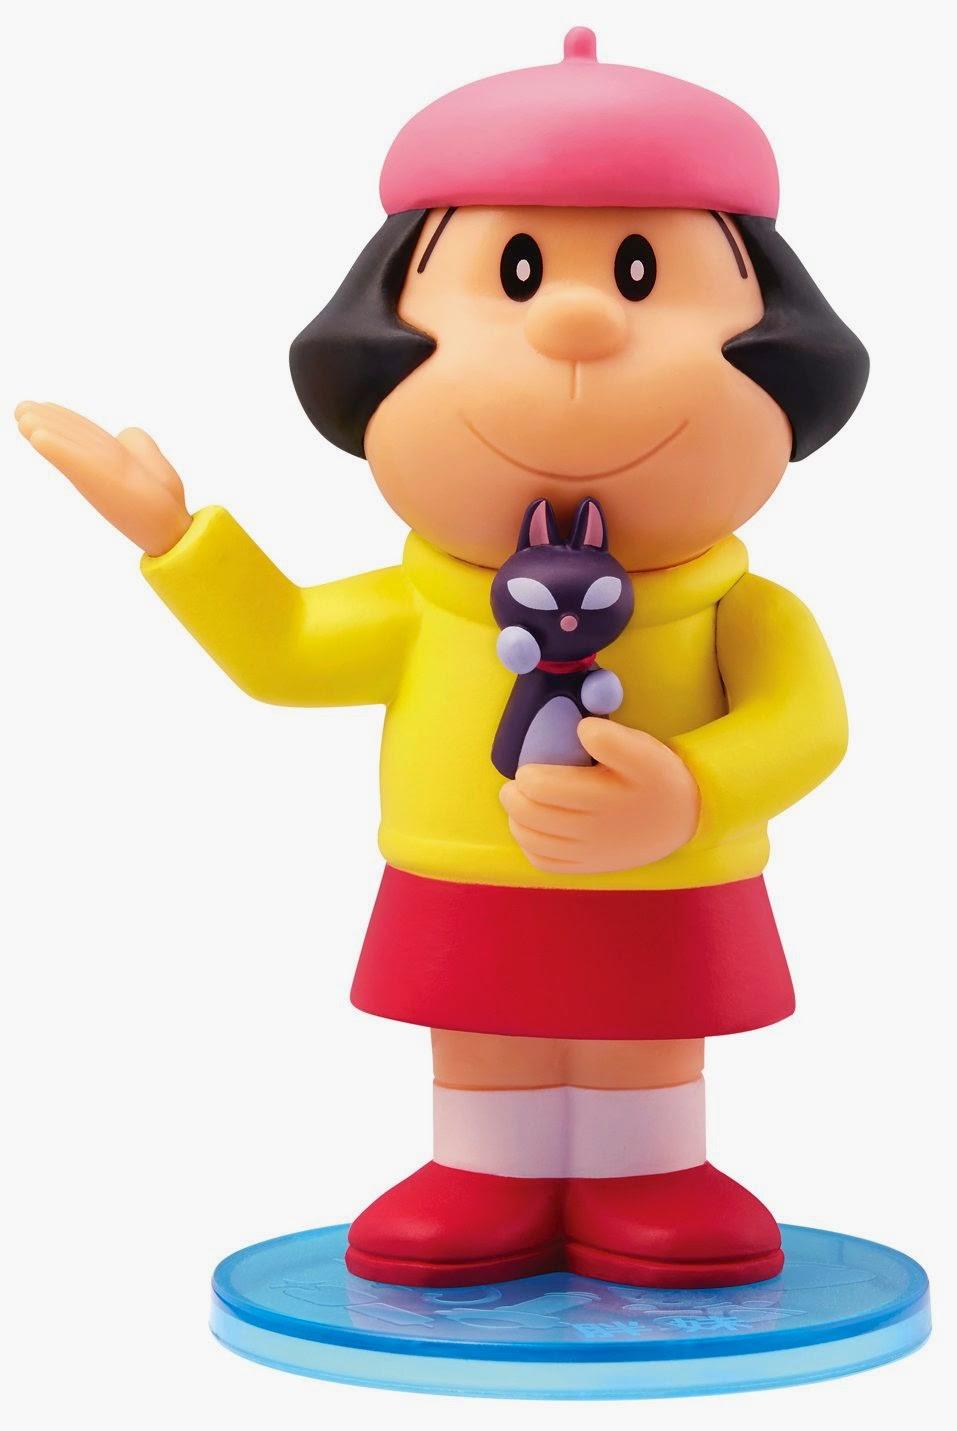 7-Eleven:換購「Doraemon & Friends 神奇法寶公仔」(24/9-18/11) ( Jetso Club 著數俱樂部 )